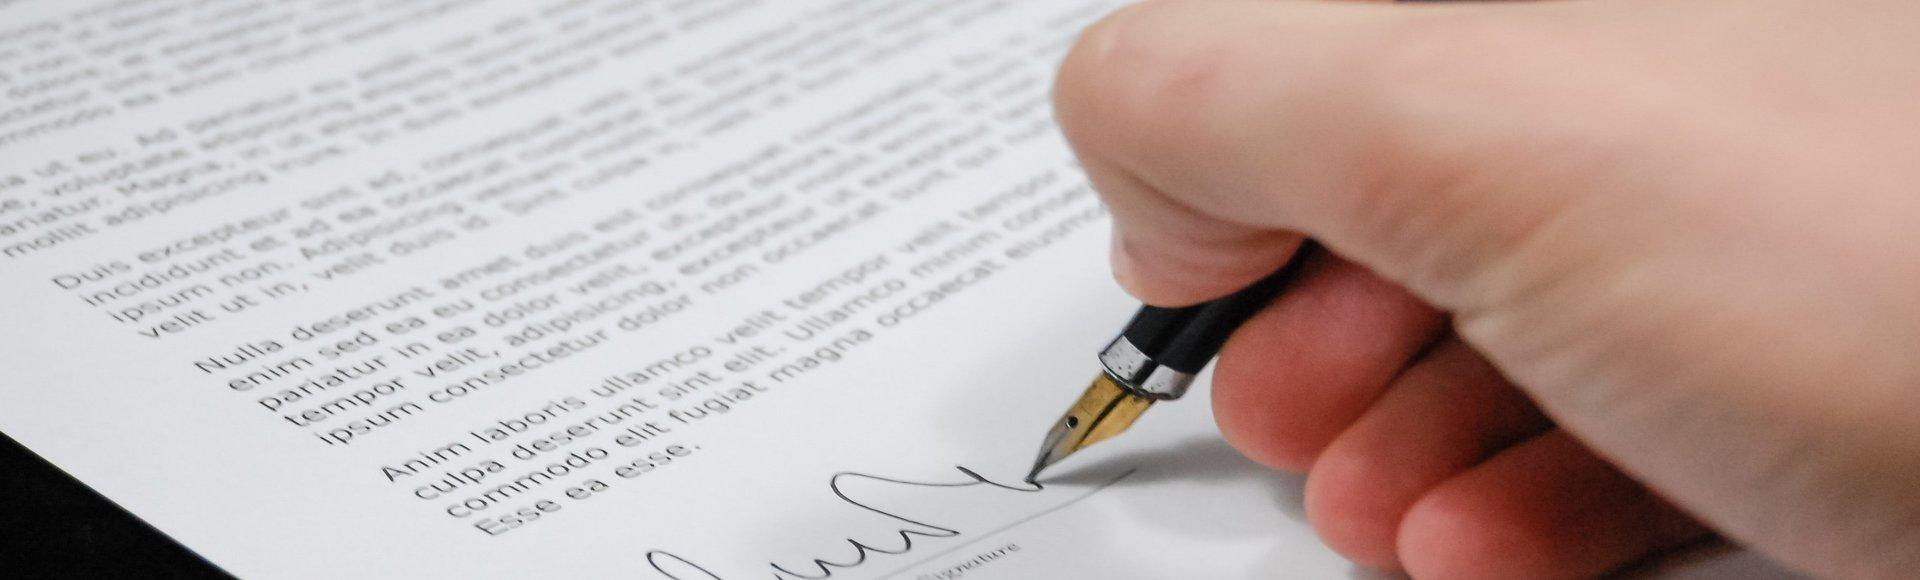 signing pen